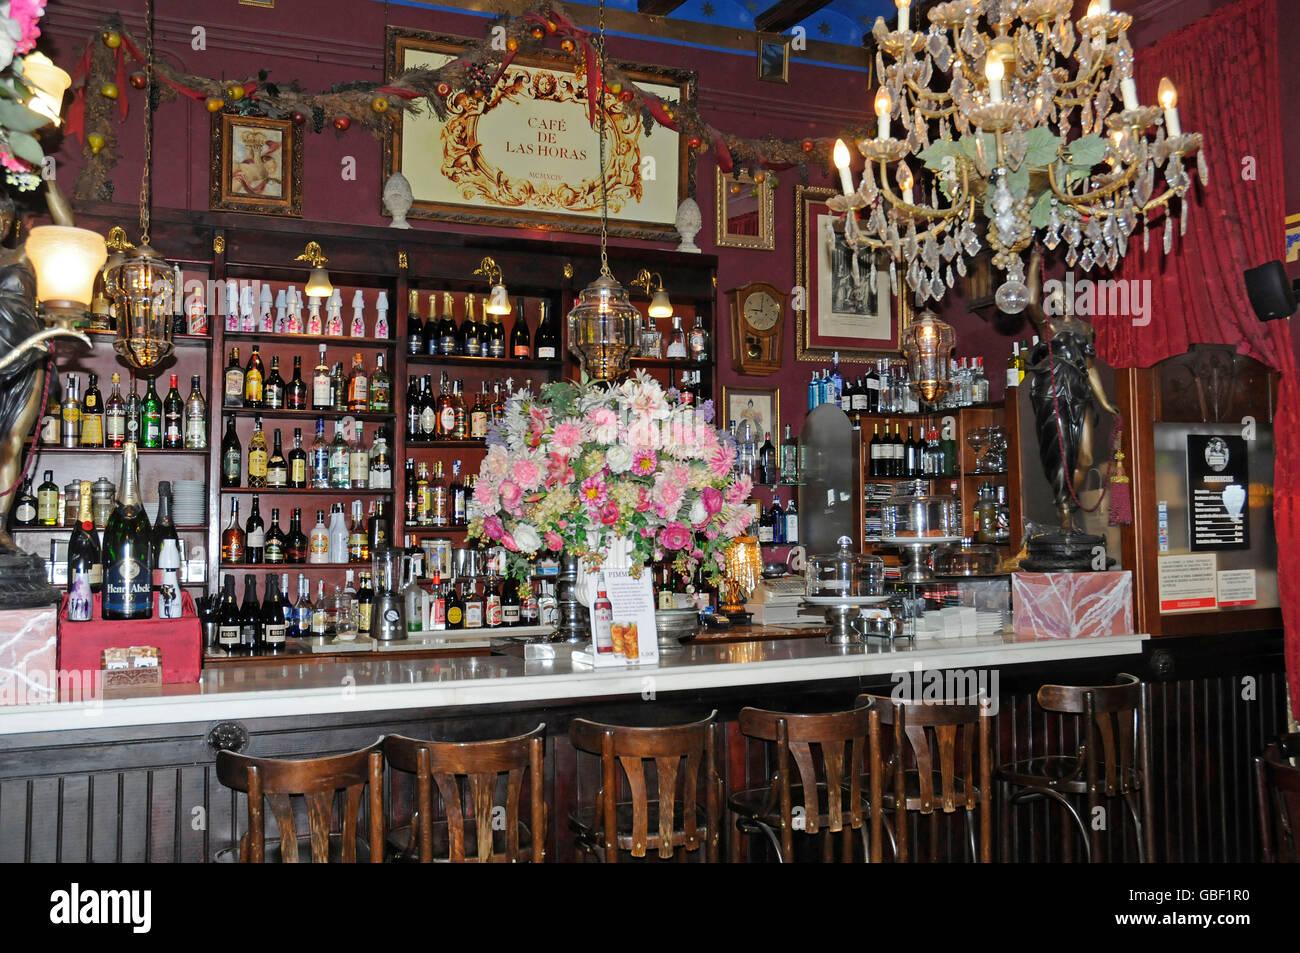 Cafe Las Horas Cafe Kaffeehaus Bar Valencia Valencia Spanien